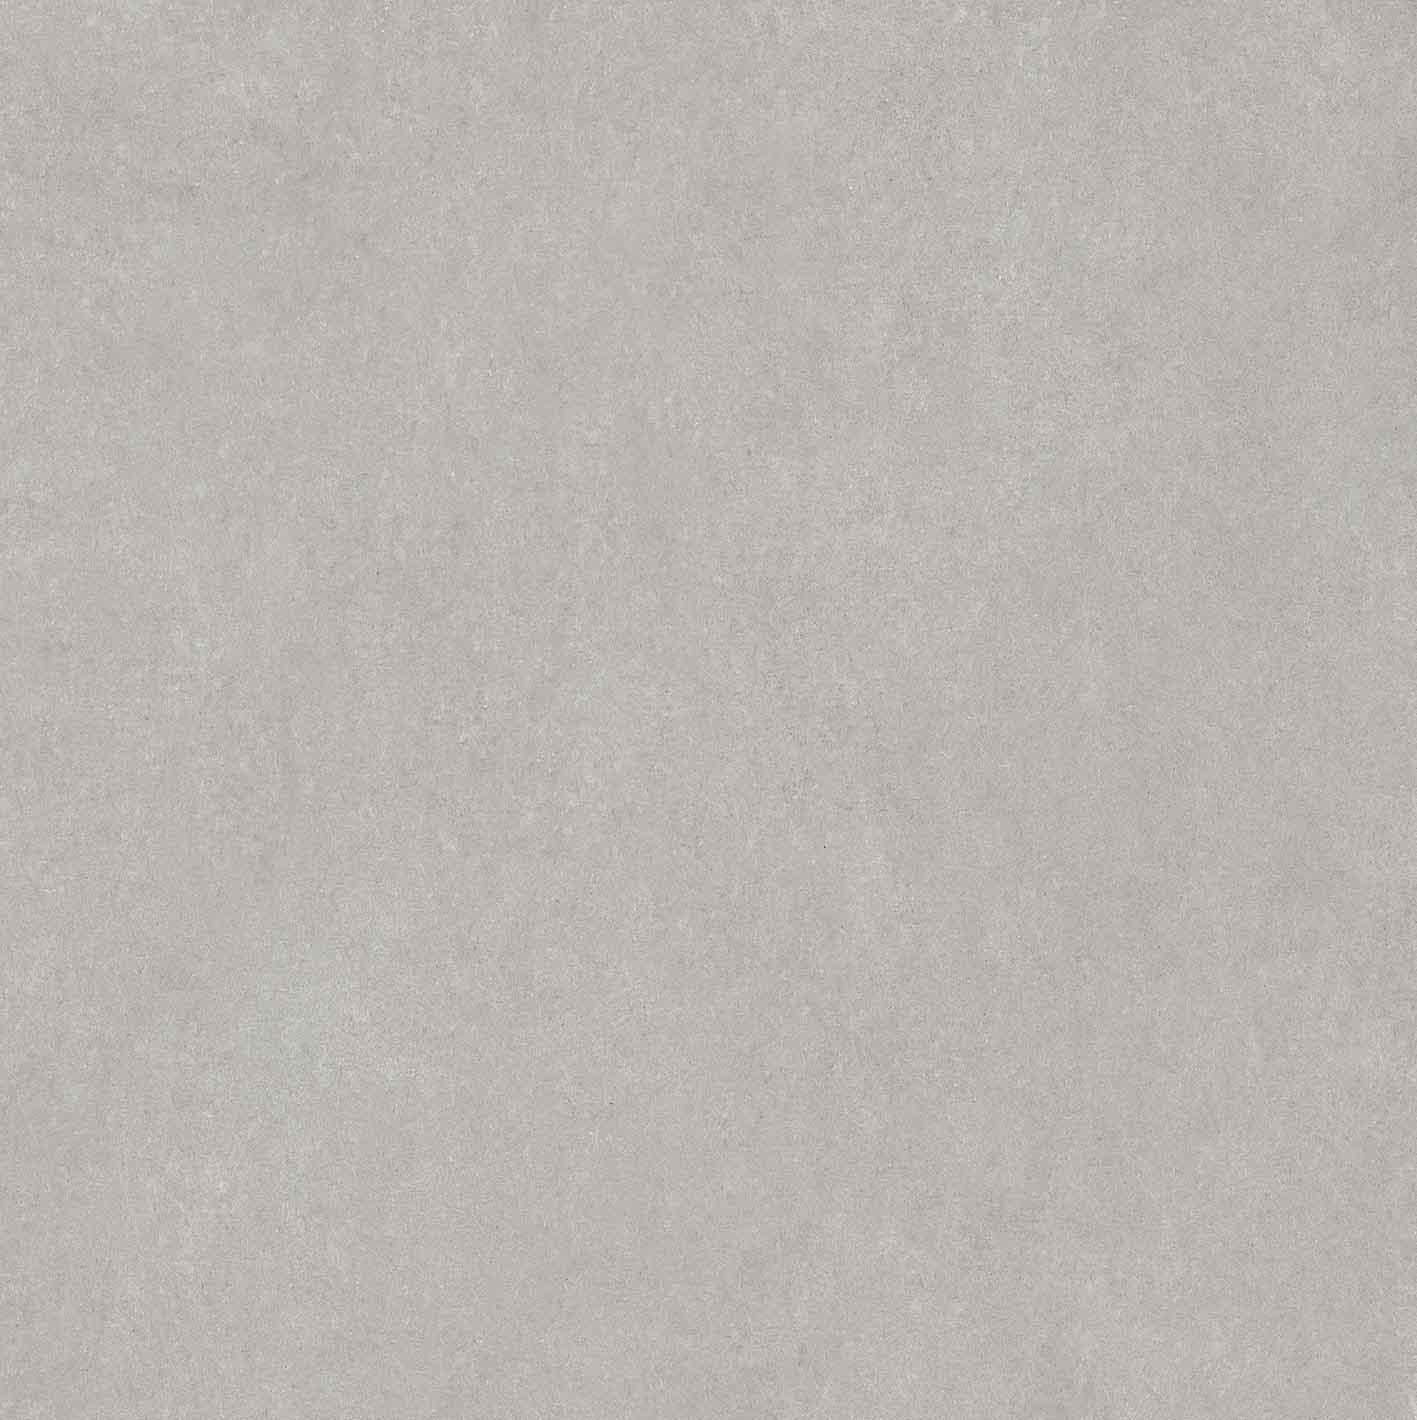 Elemental Stone Grey Sandstone Matte 10mm 120 x 120